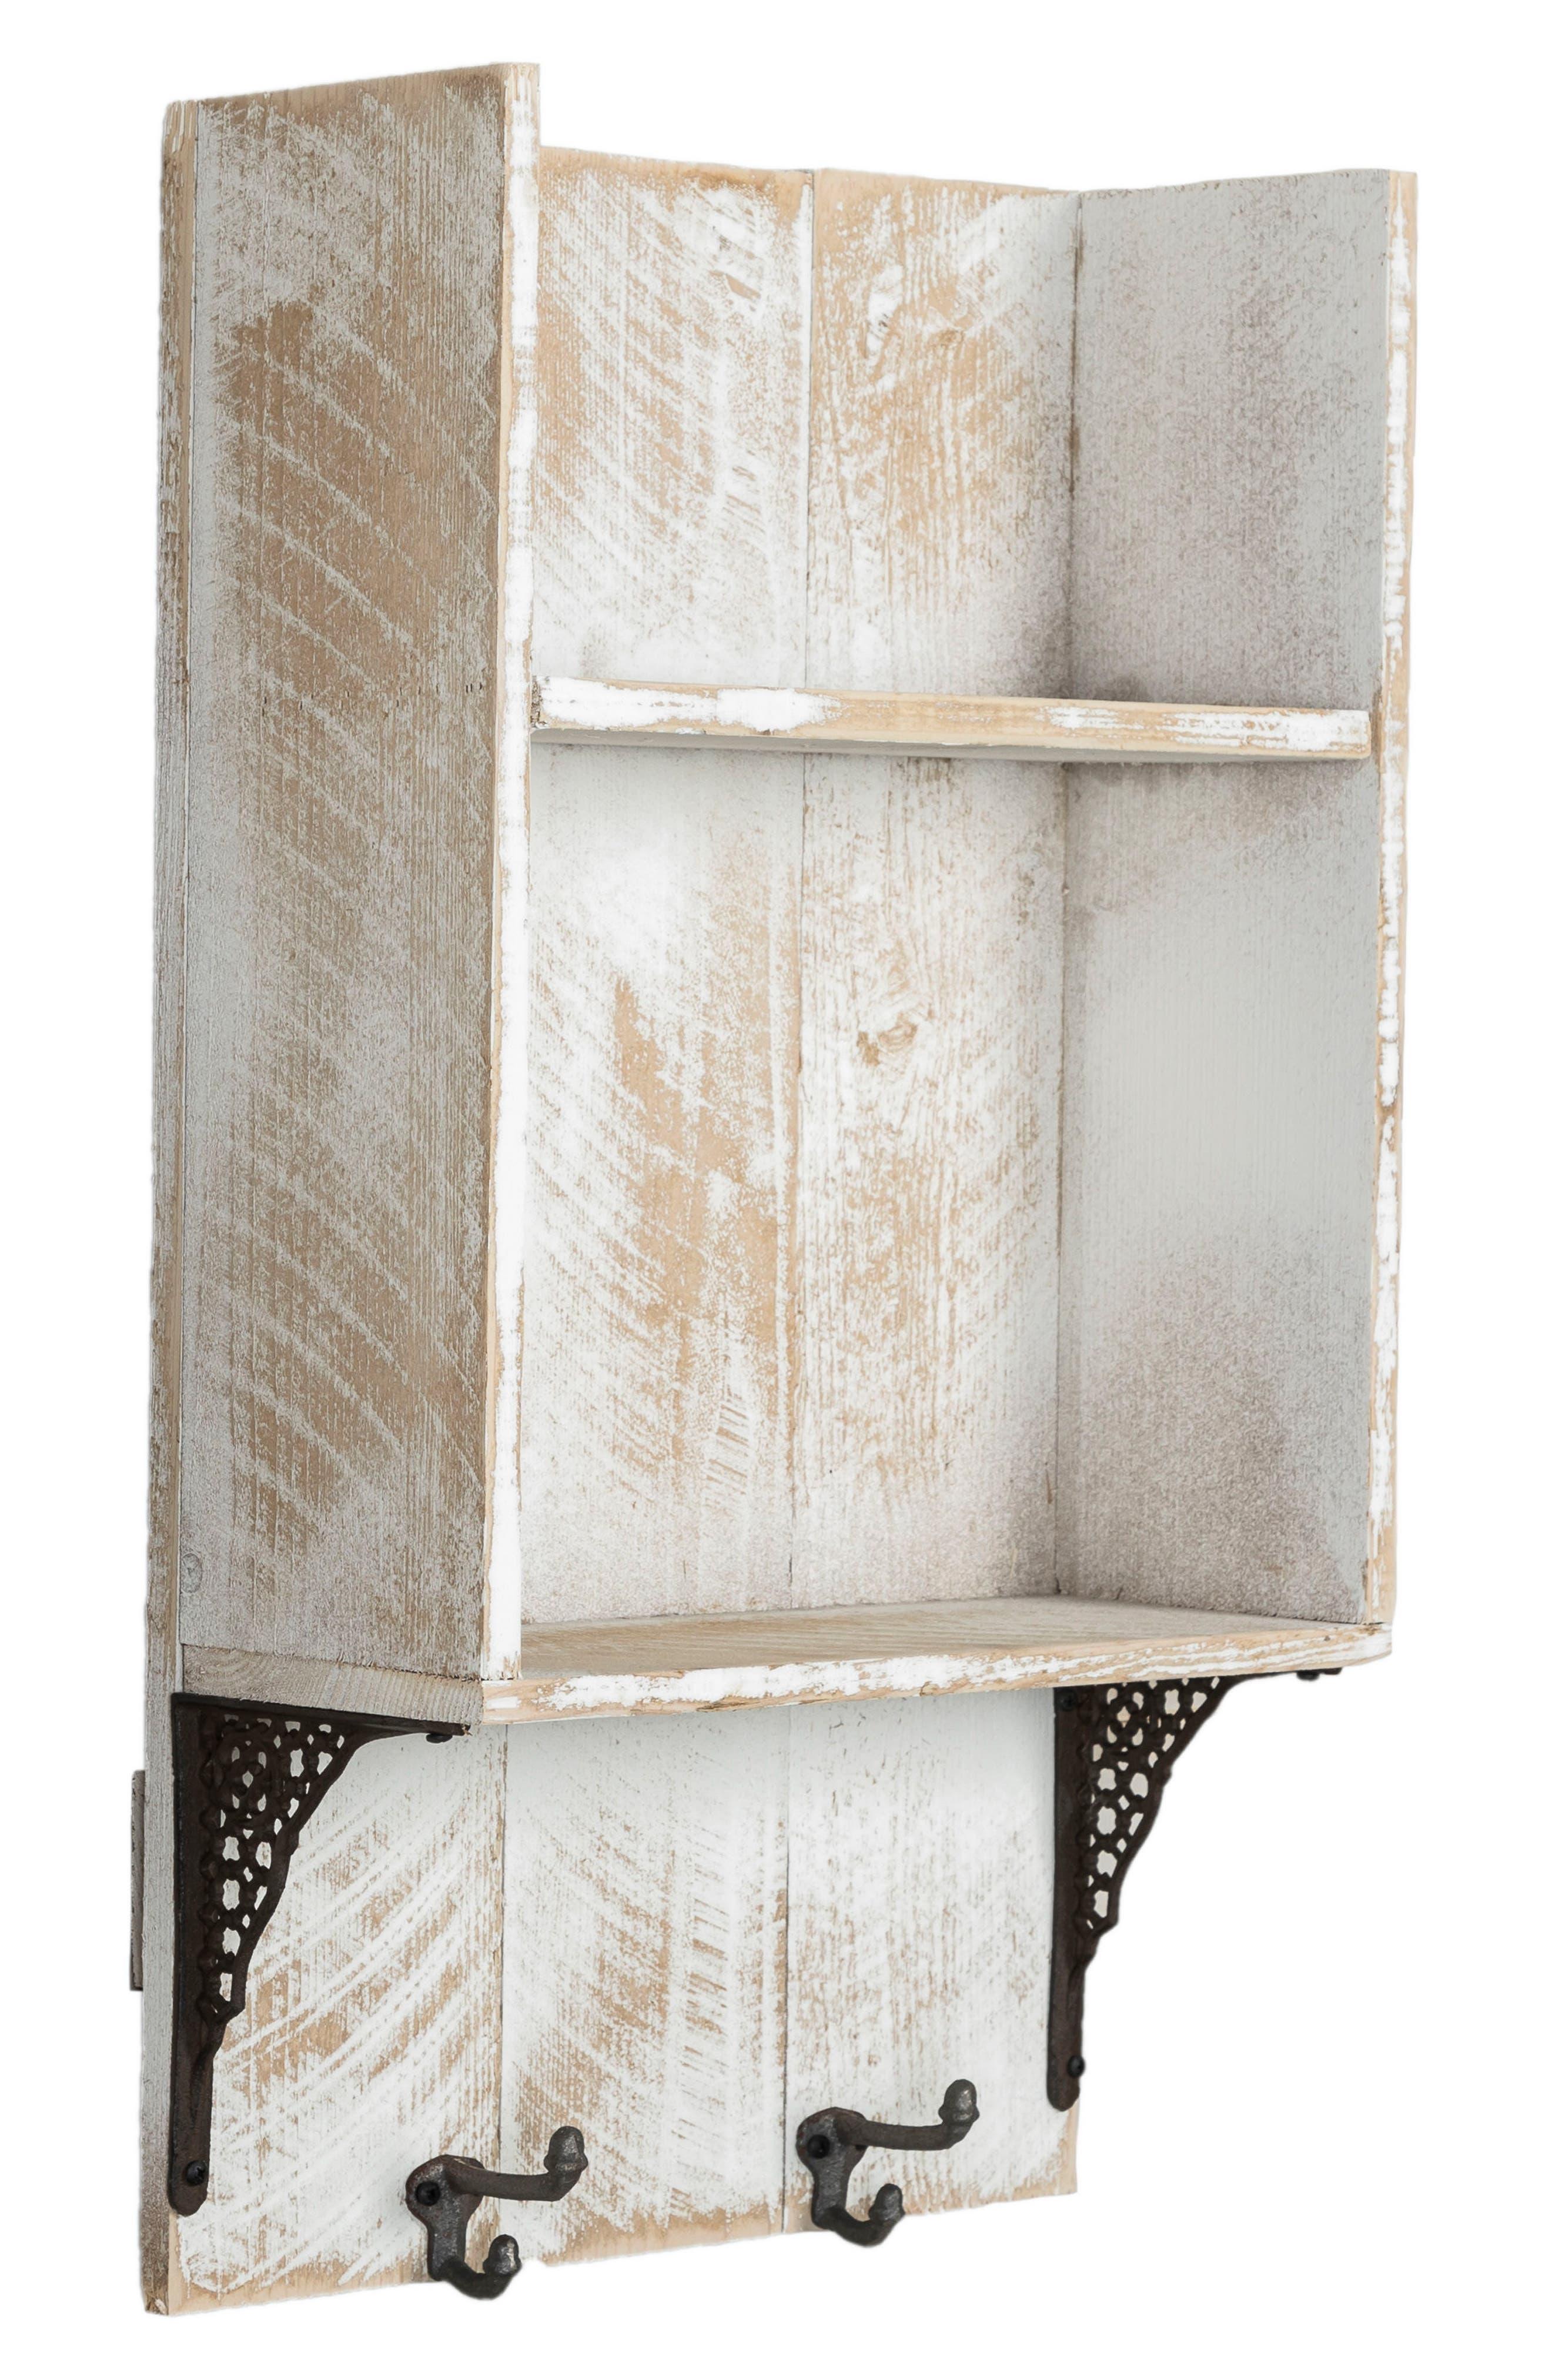 Reclaimed Wood Shelf with Hooks,                             Alternate thumbnail 2, color,                             100